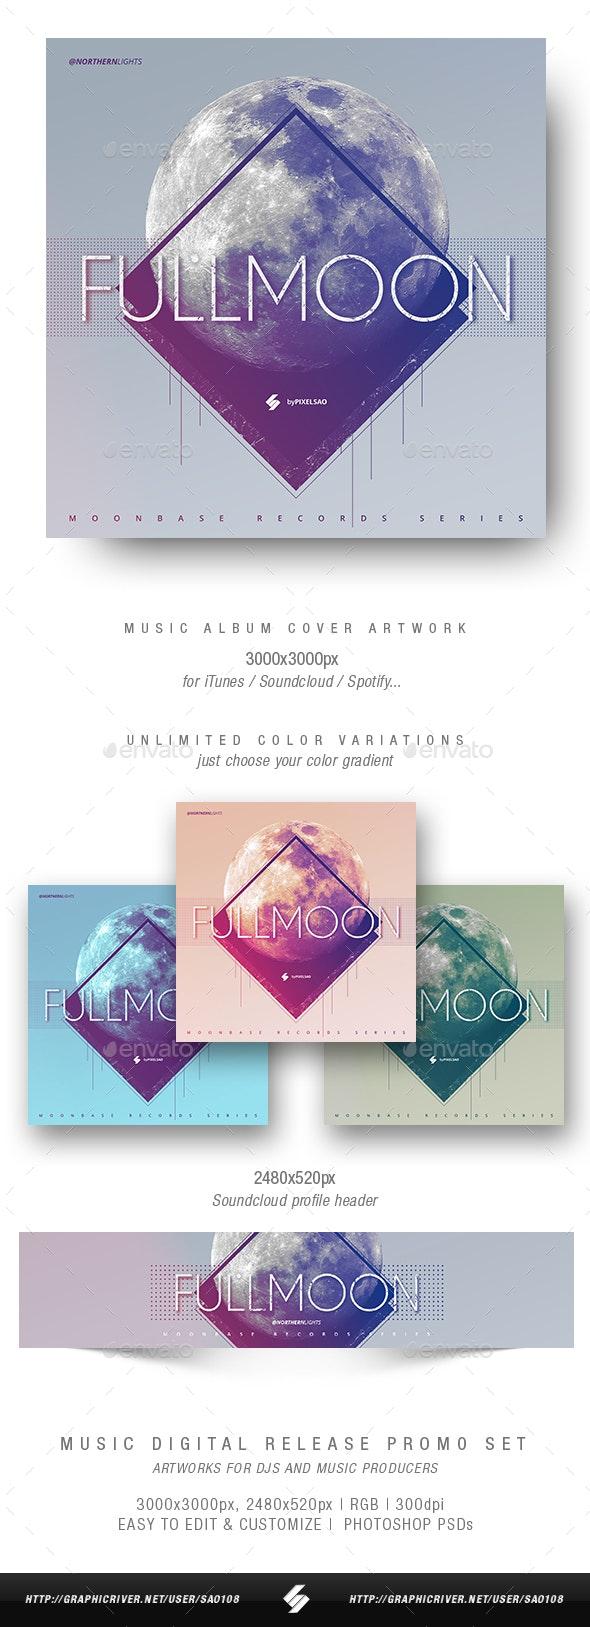 Full Moon - Music Album Cover Artwork Template - Miscellaneous Social Media